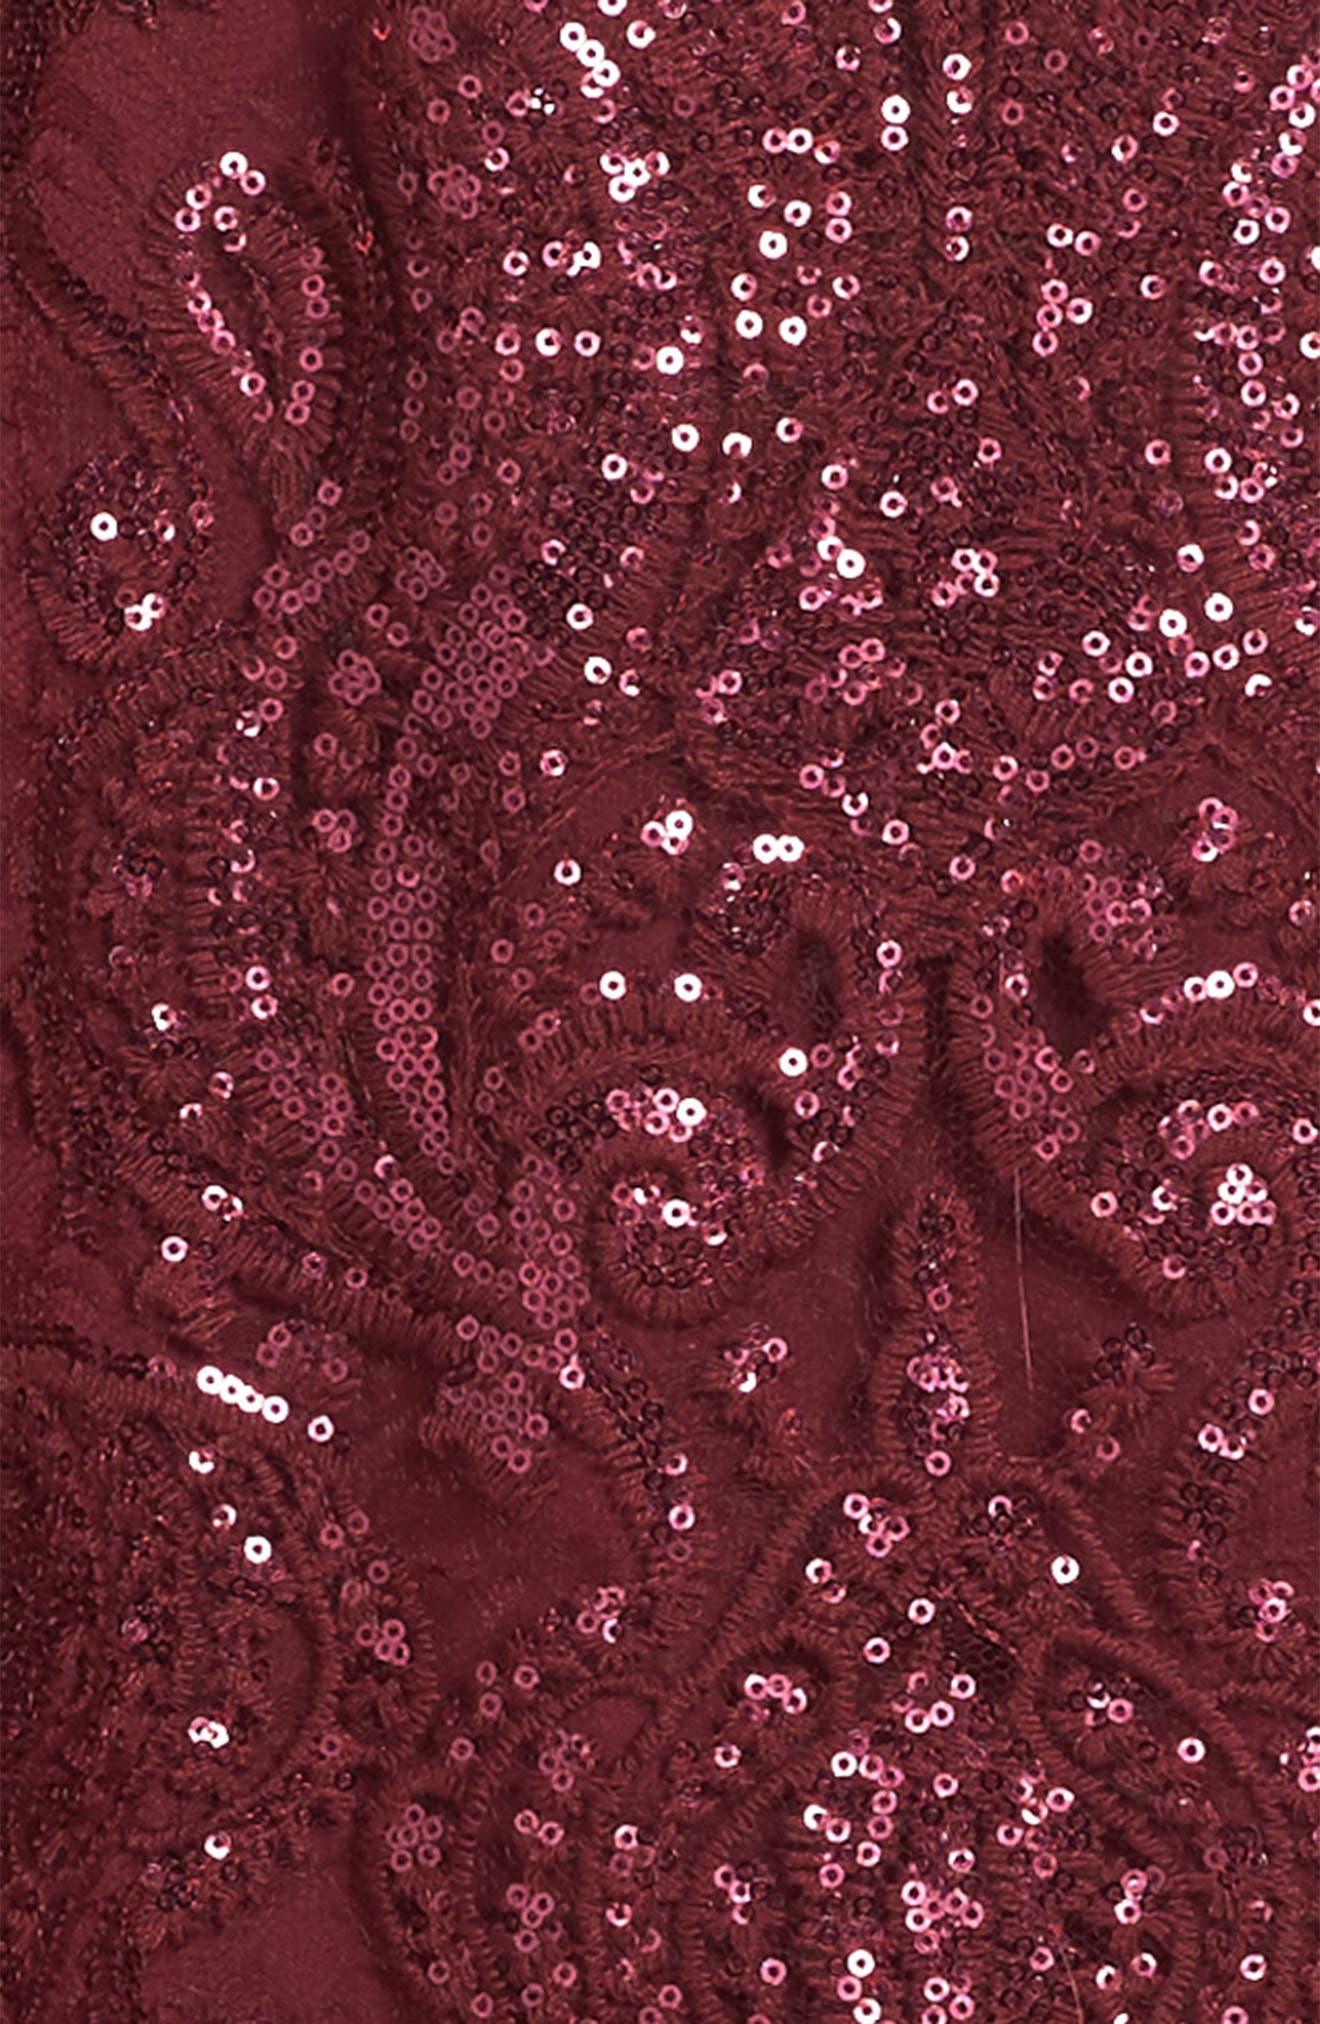 Scalloped Sequin Embellished Shift Dress,                             Alternate thumbnail 3, color,                             600